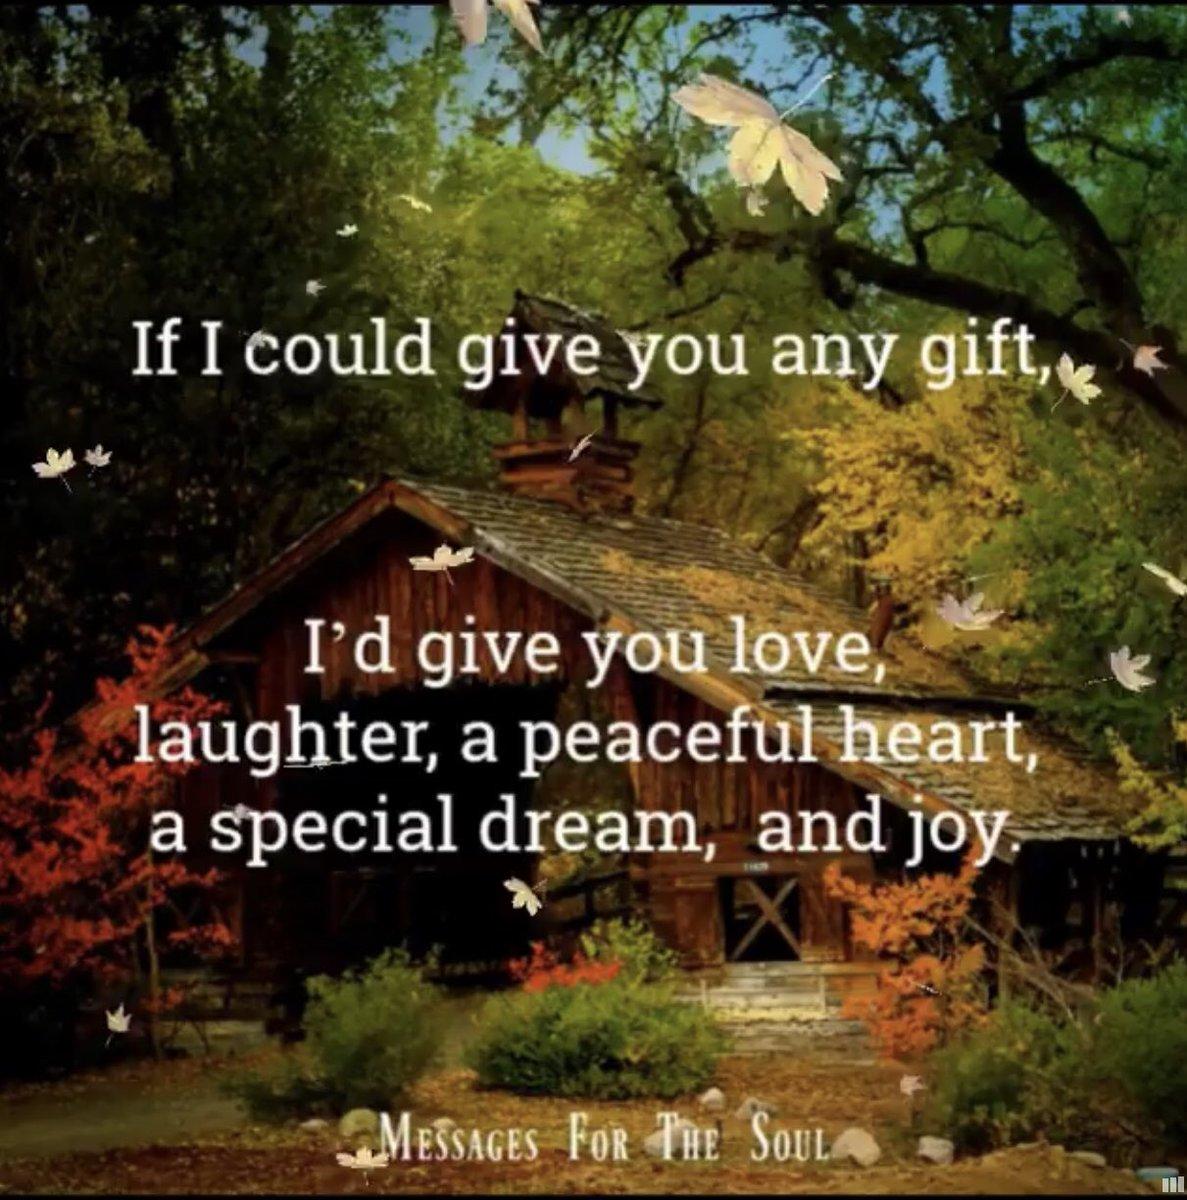 @FlowerSree @snowleopard56 @encarnacion67 @gamila2103 @justbeyou432 @FlowerchildRT a peaceful weekend everyone 💚🧡💙💛❤️